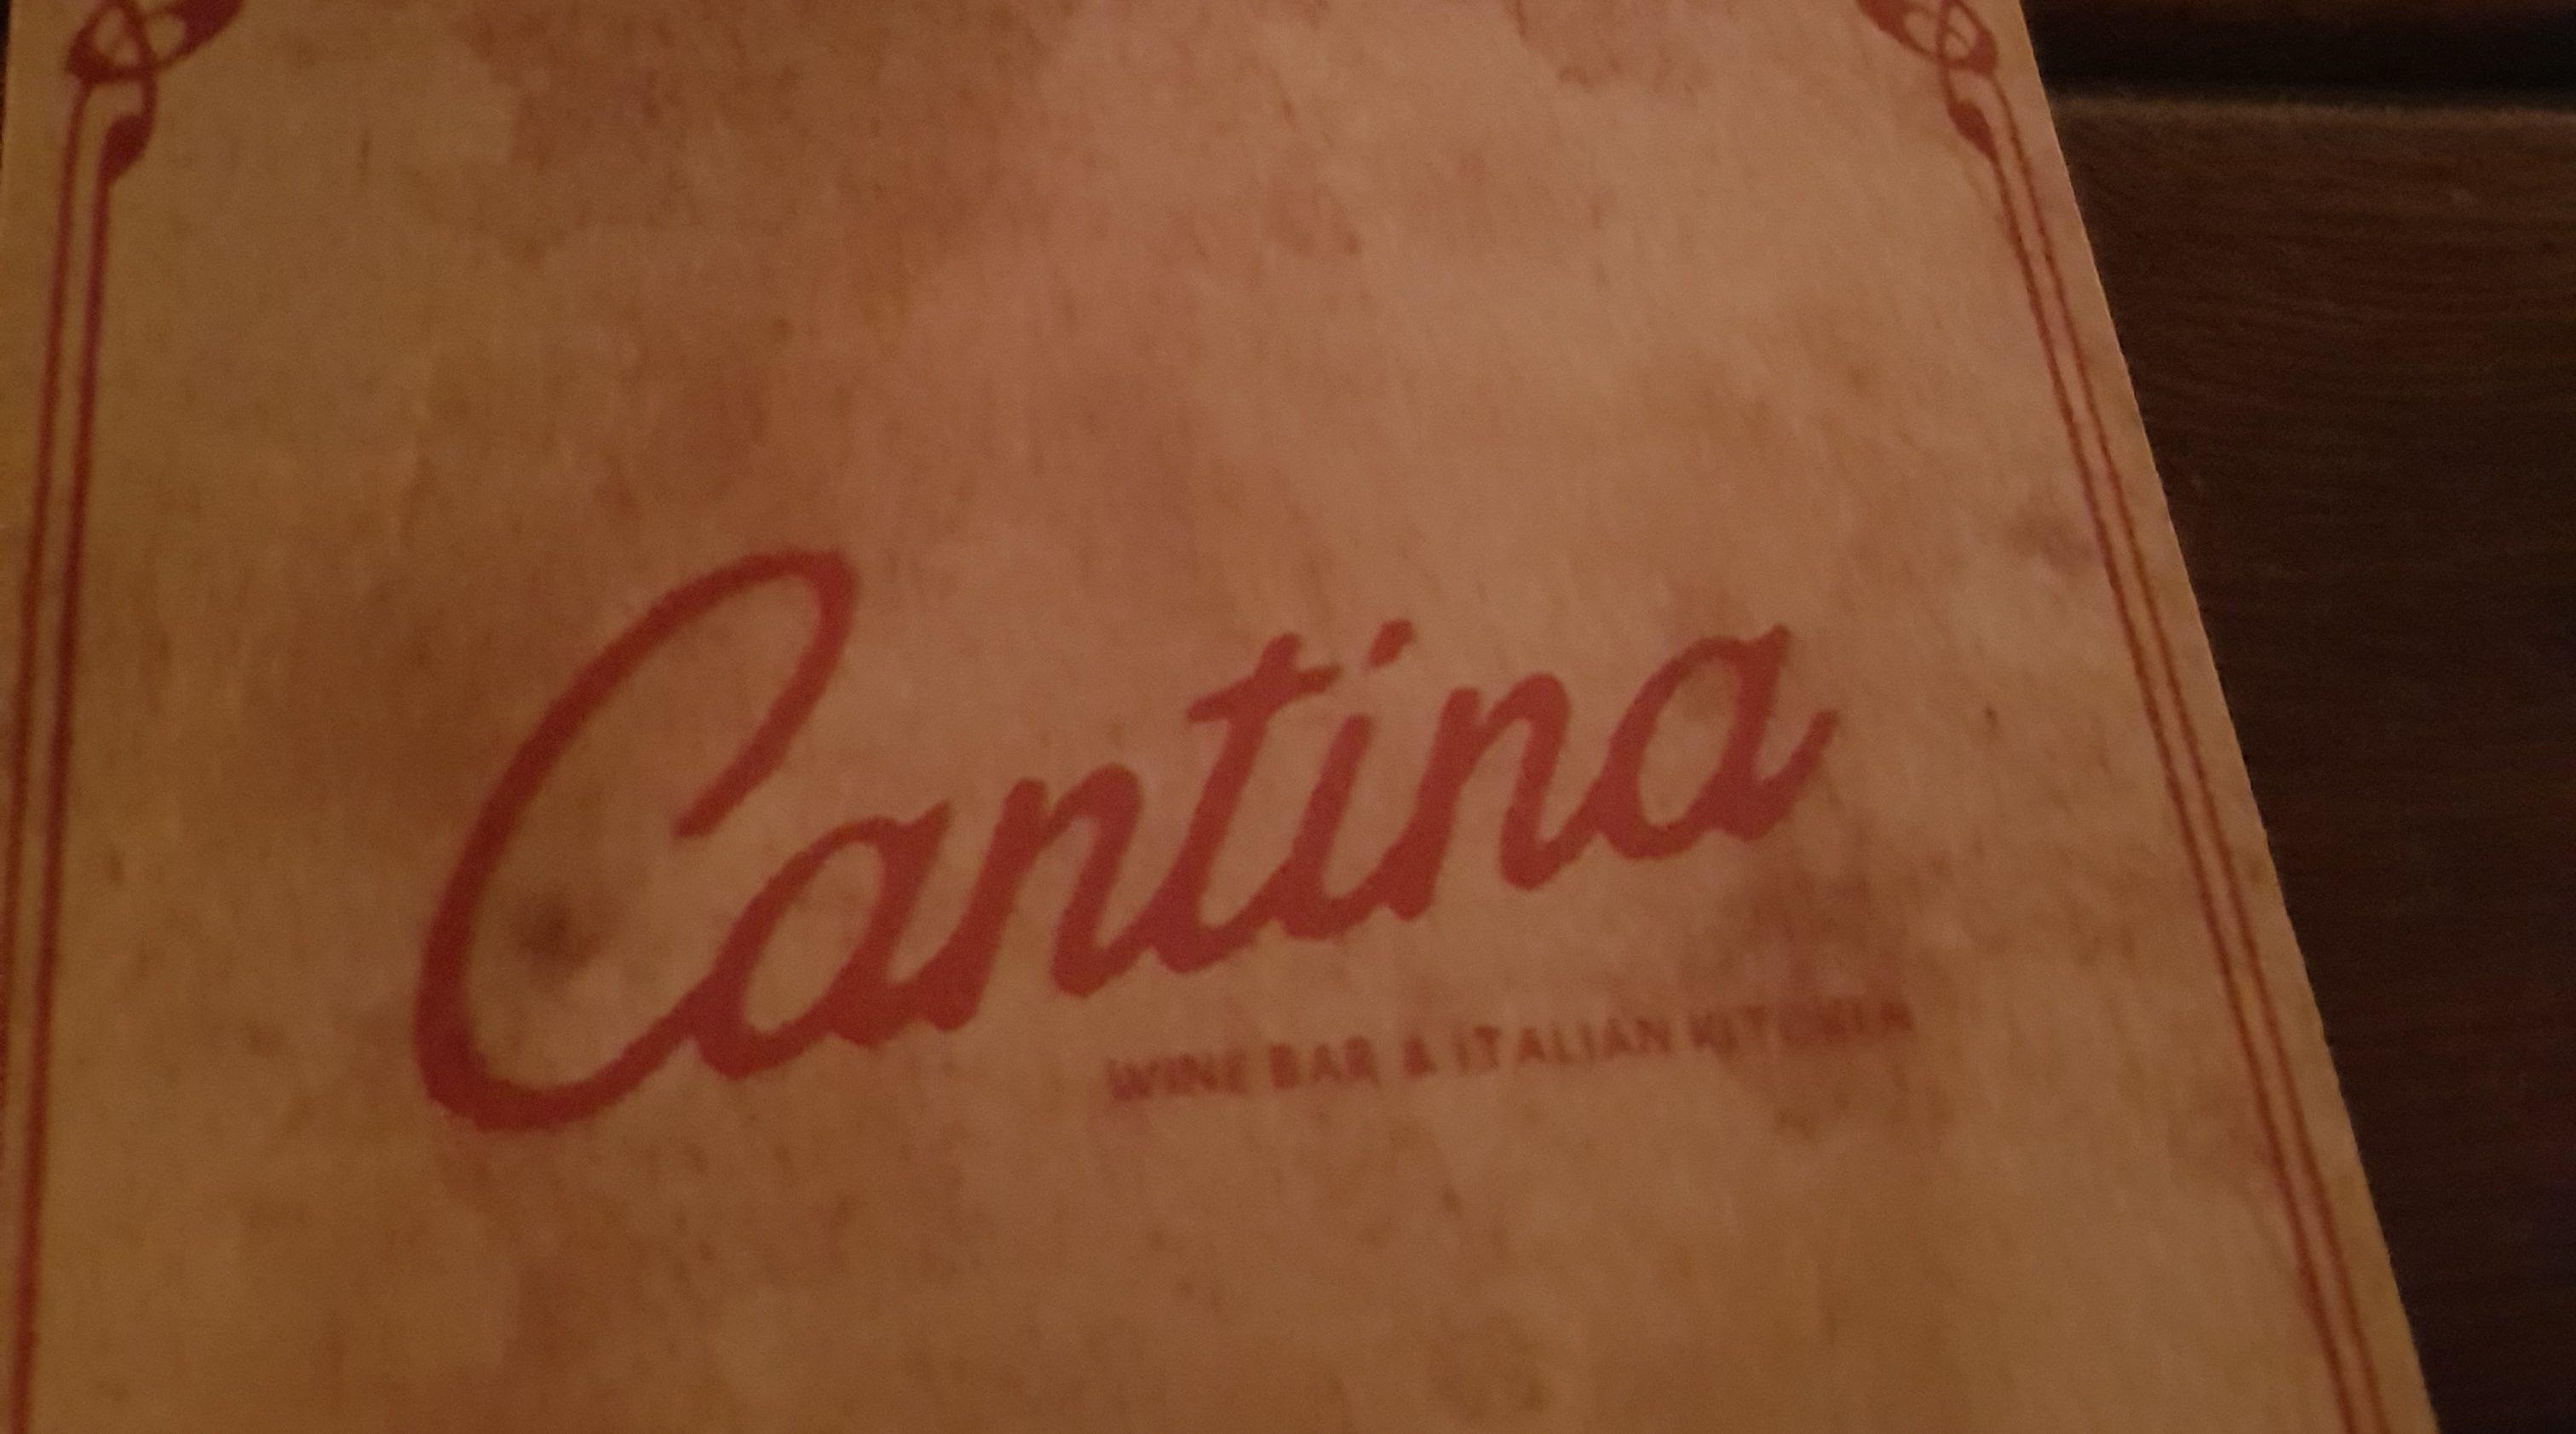 cantina italian restaurant bangkok